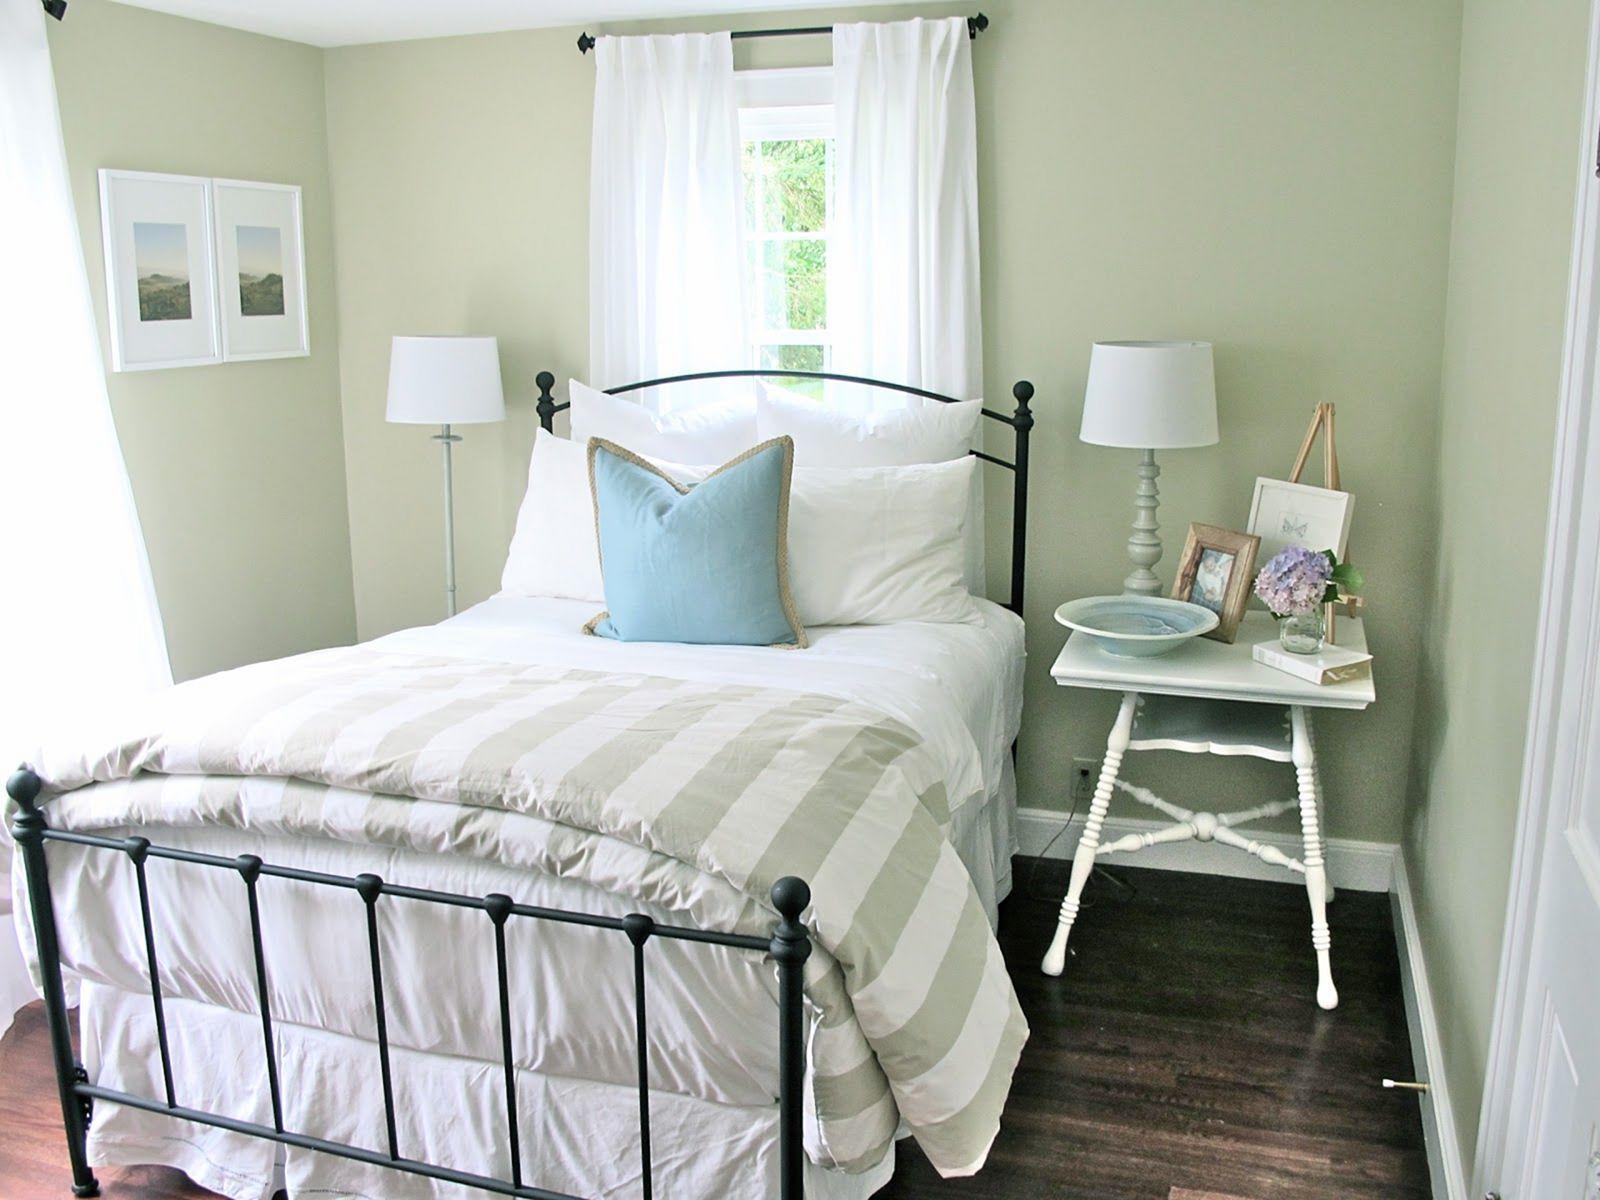 30 Comfy Small Guest Bedroom Designs So Guests Feel Happy Visiting Small Guest Rooms Small Guest Bedroom Spare Bedroom Decor